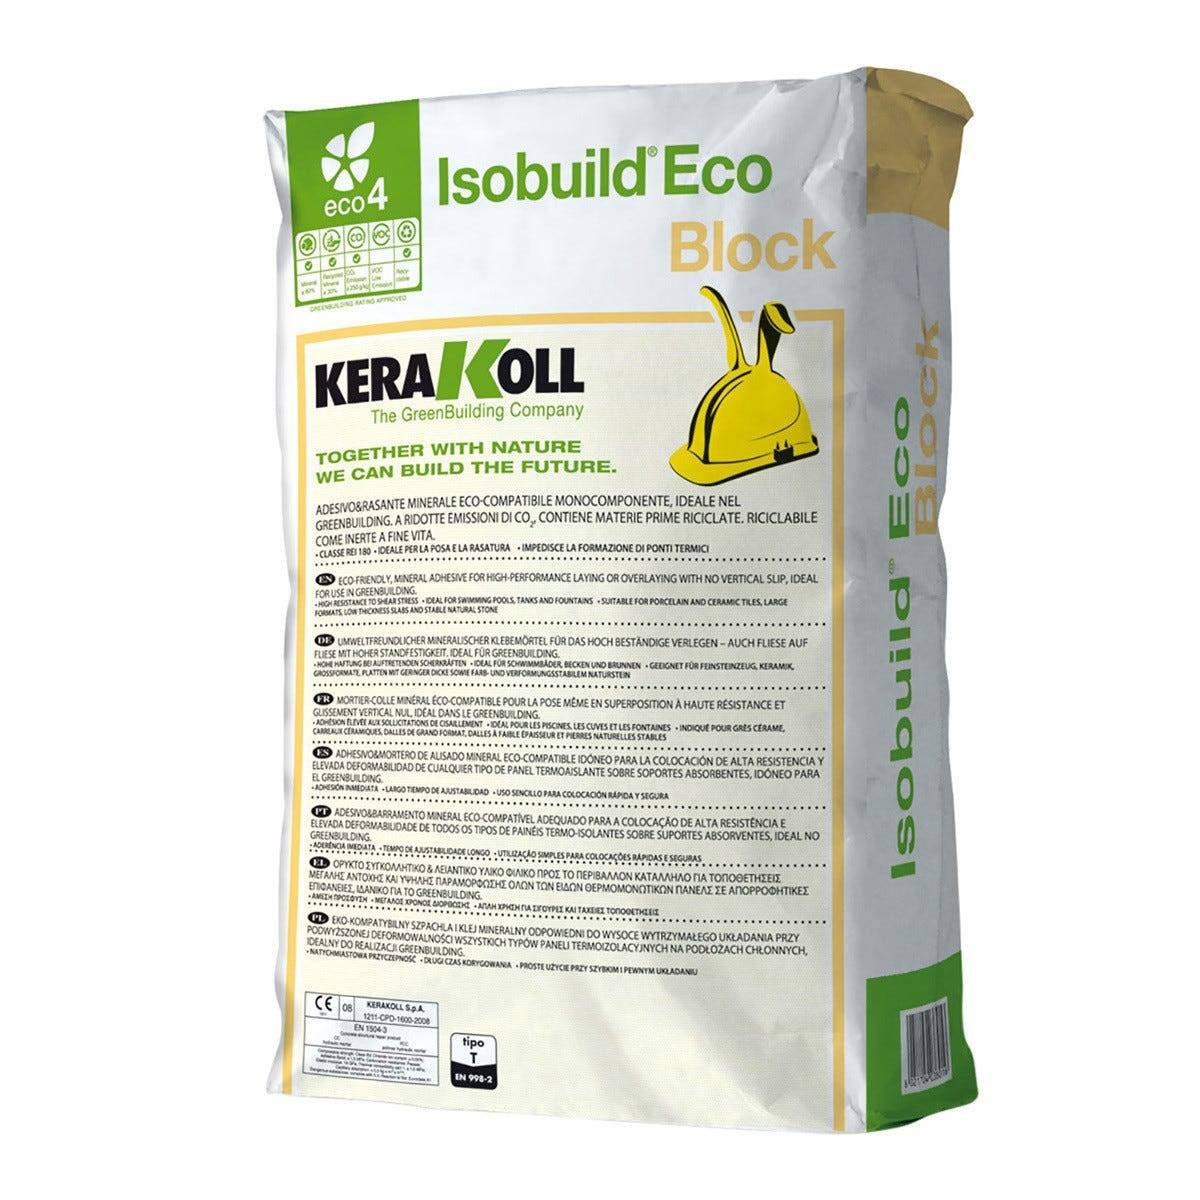 KERAKOLL Malta Rasante Isobuild Block Per Blocchi Ytong Gasbeton Certificata Rei 120 25 Kg